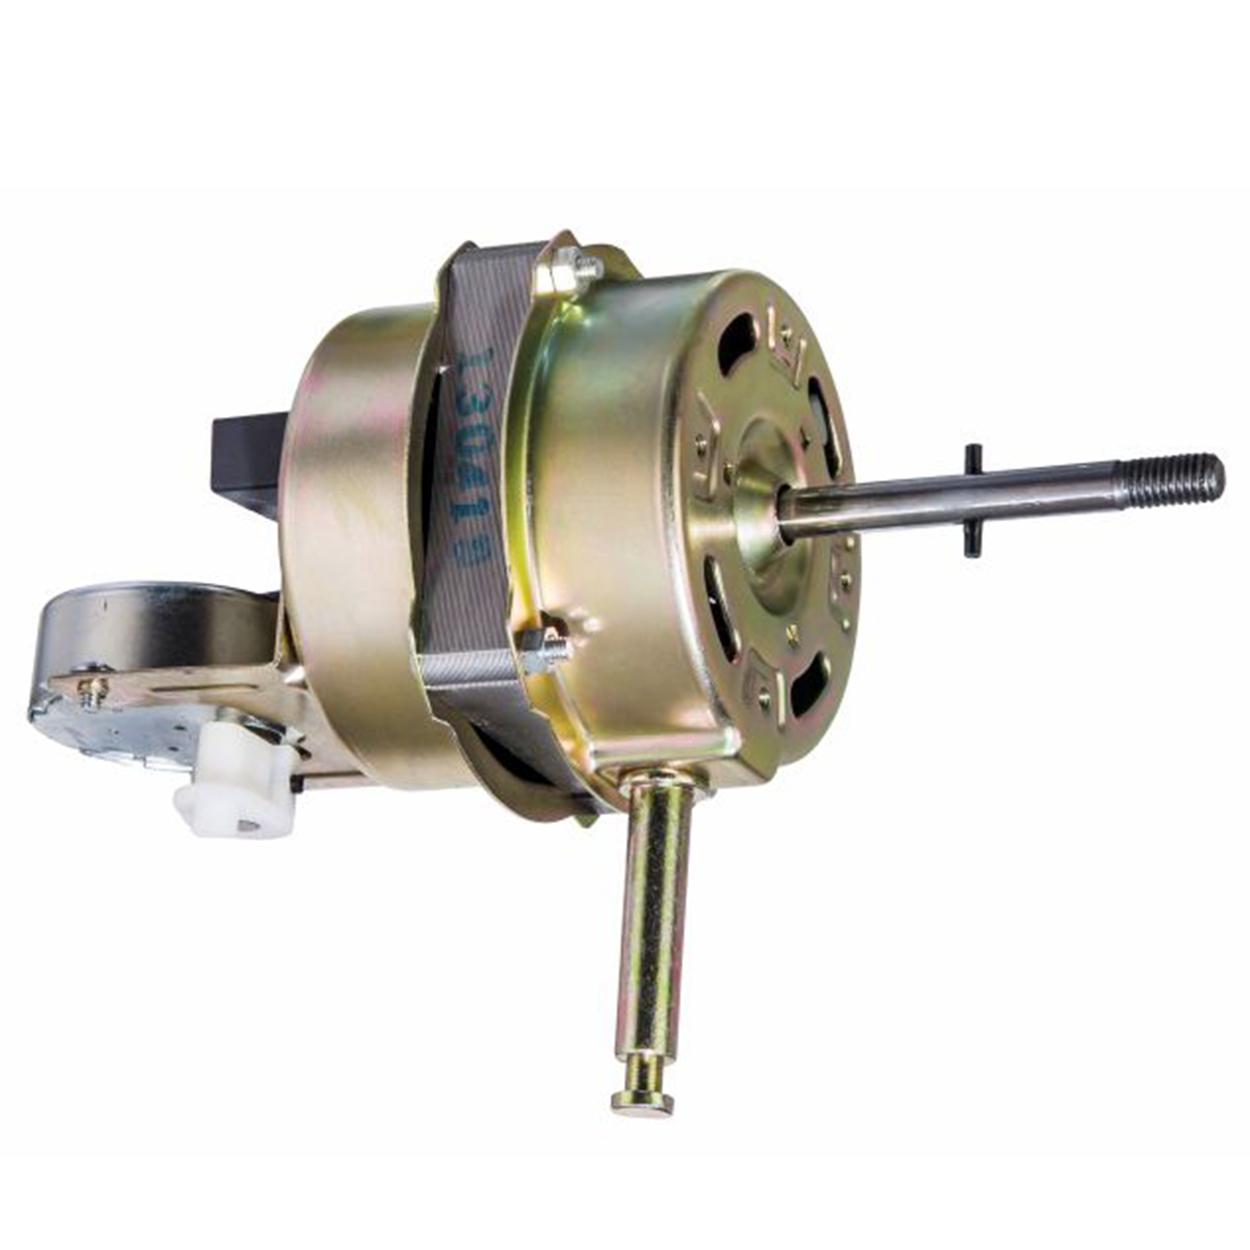 AC Electric oscillating wall fan motor